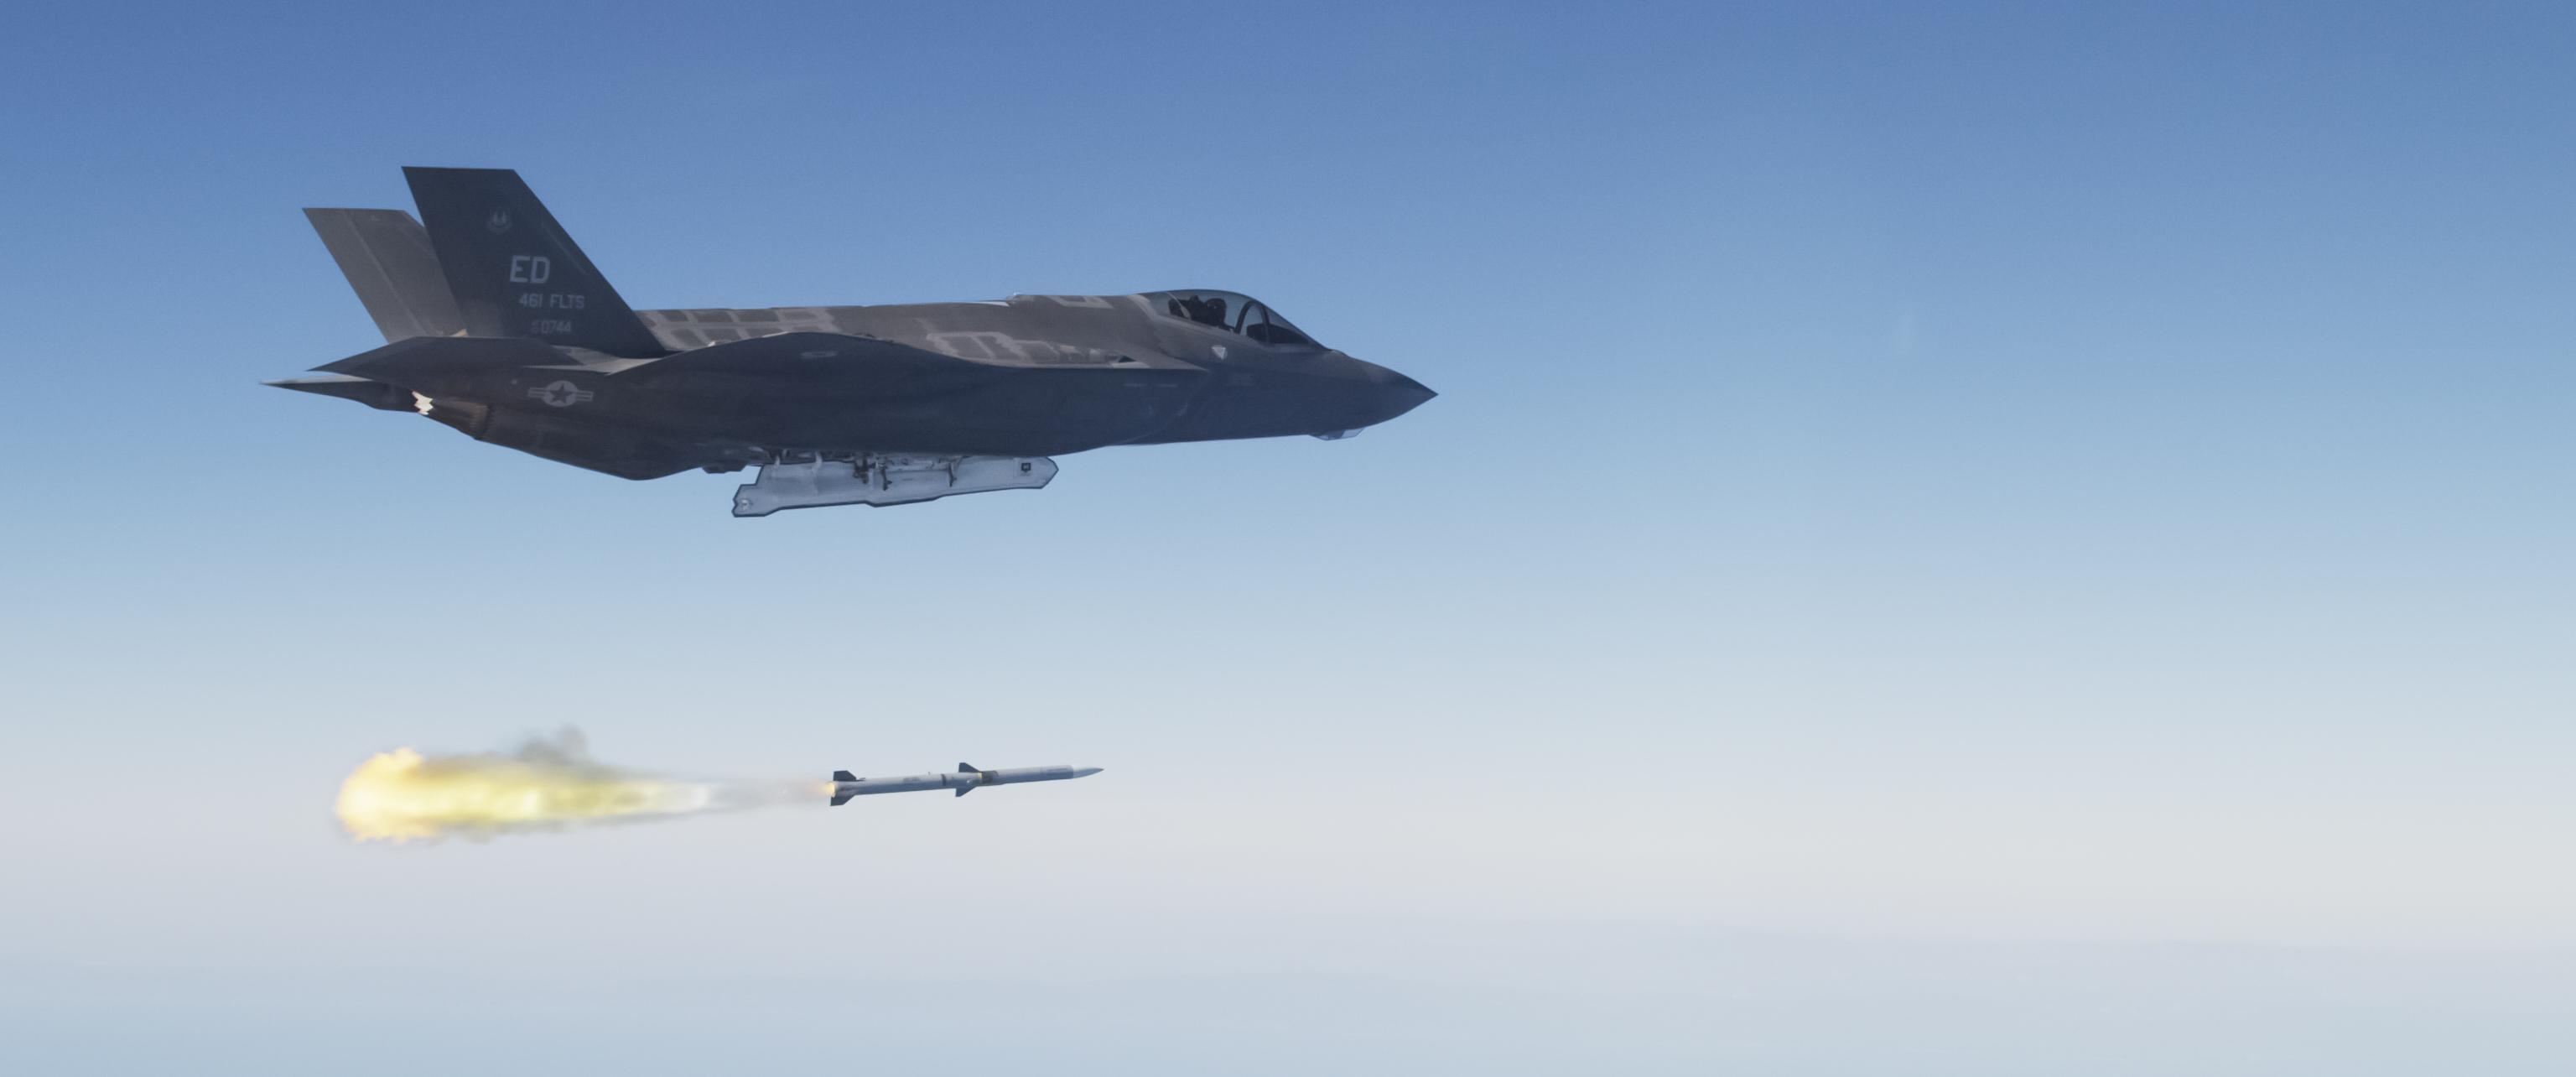 f-35 icbm intercept north korea